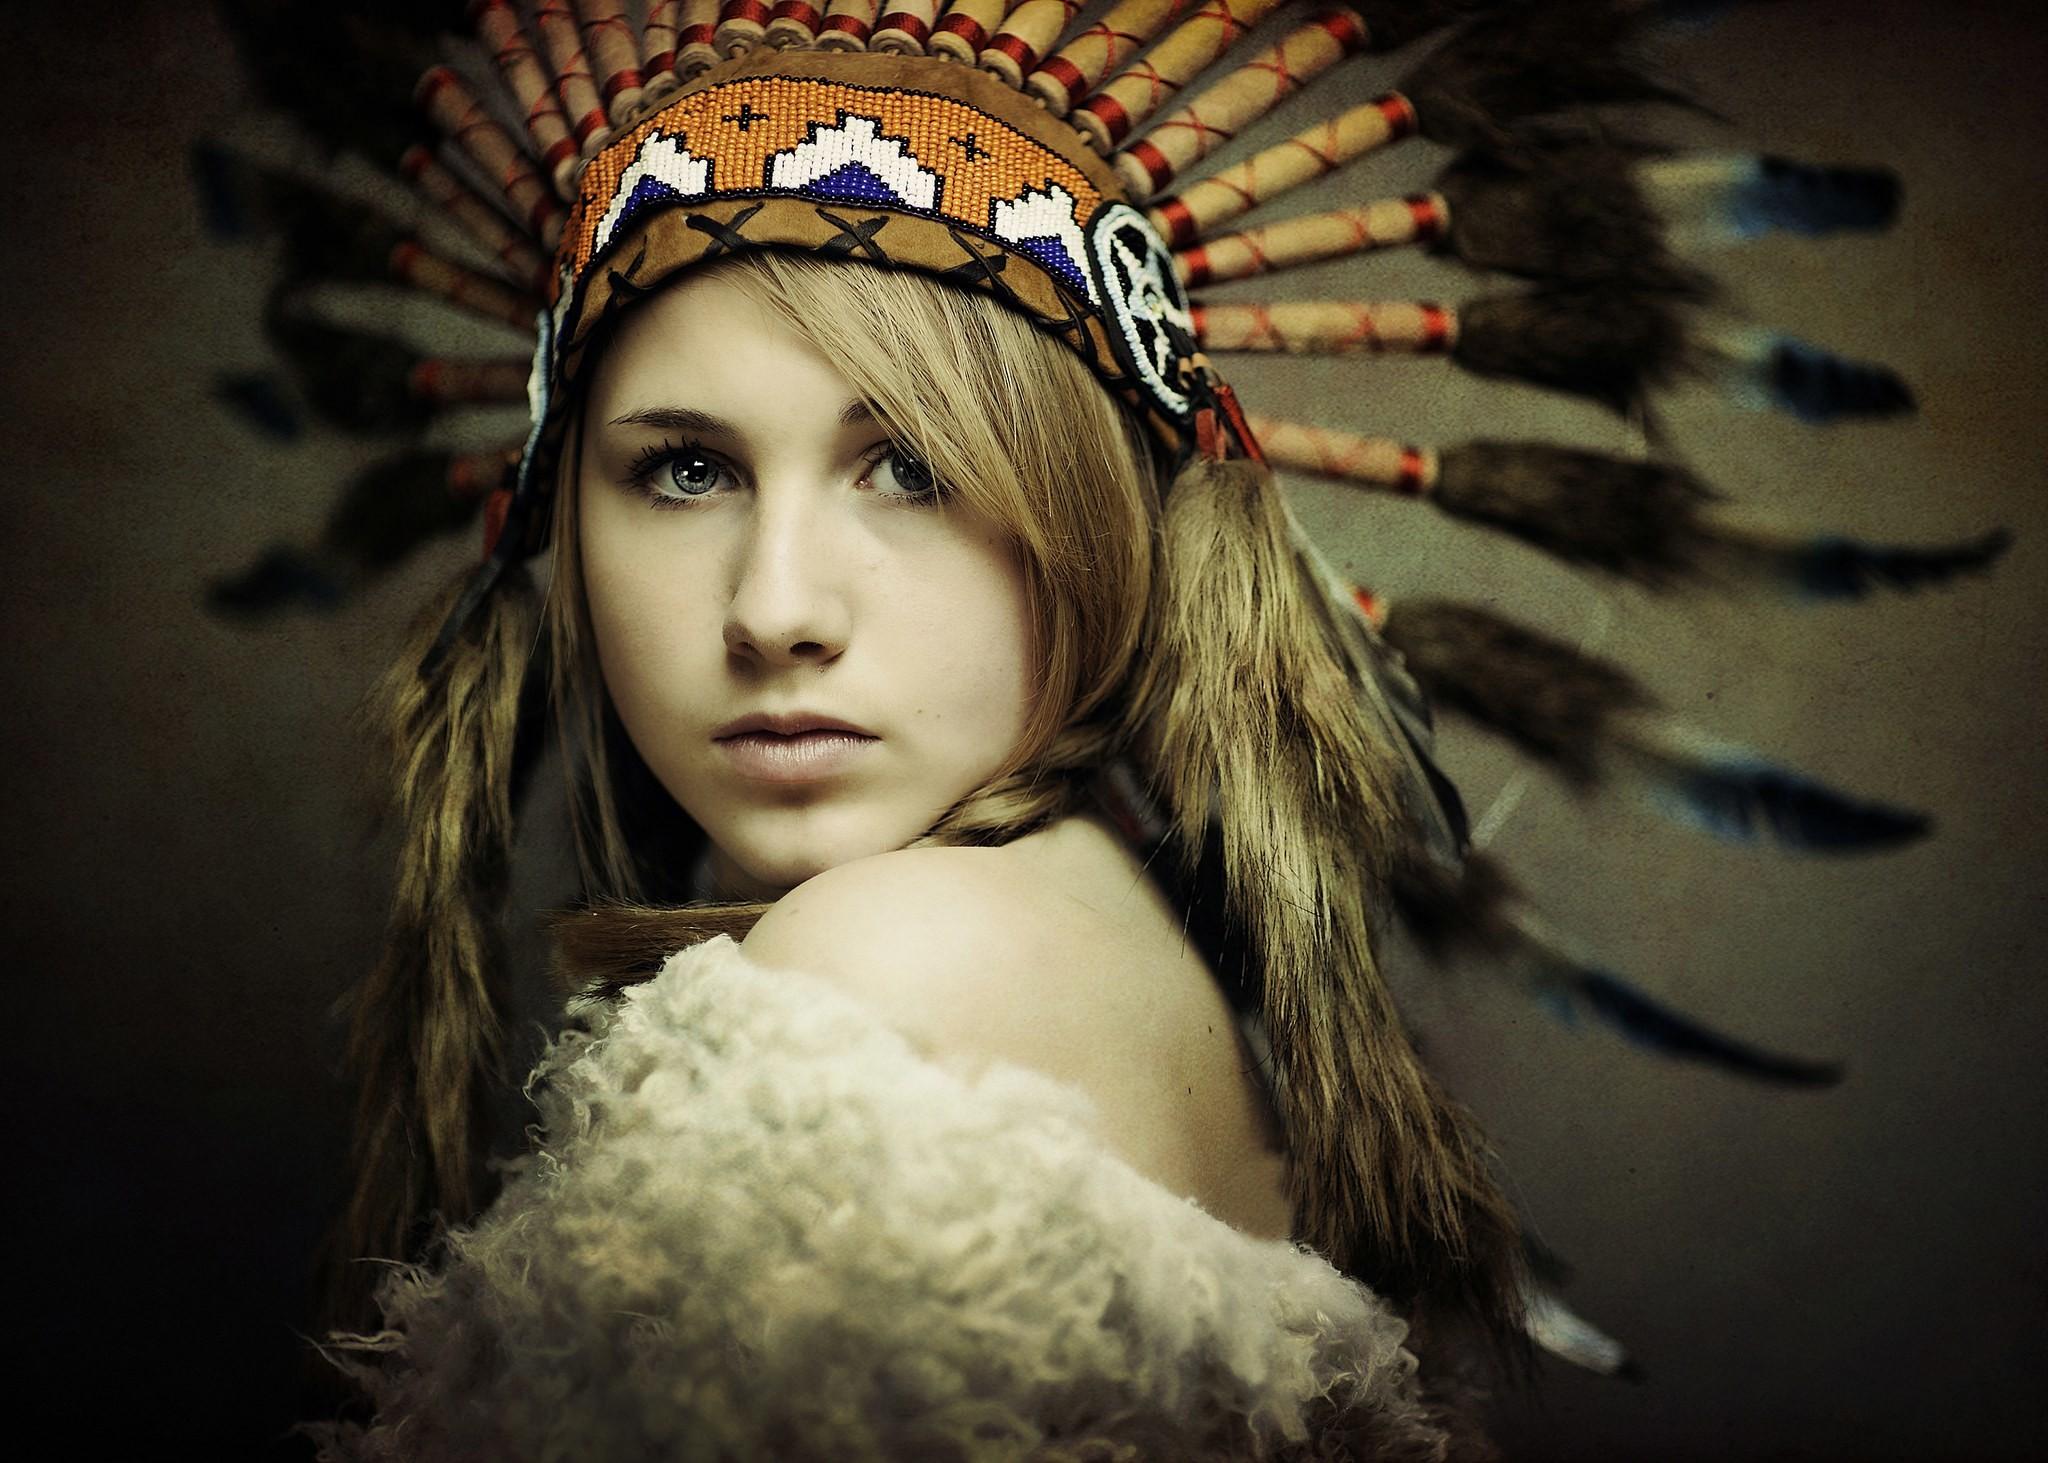 native american screensavers backgrounds by Ekewaka Young (2017-03-08)